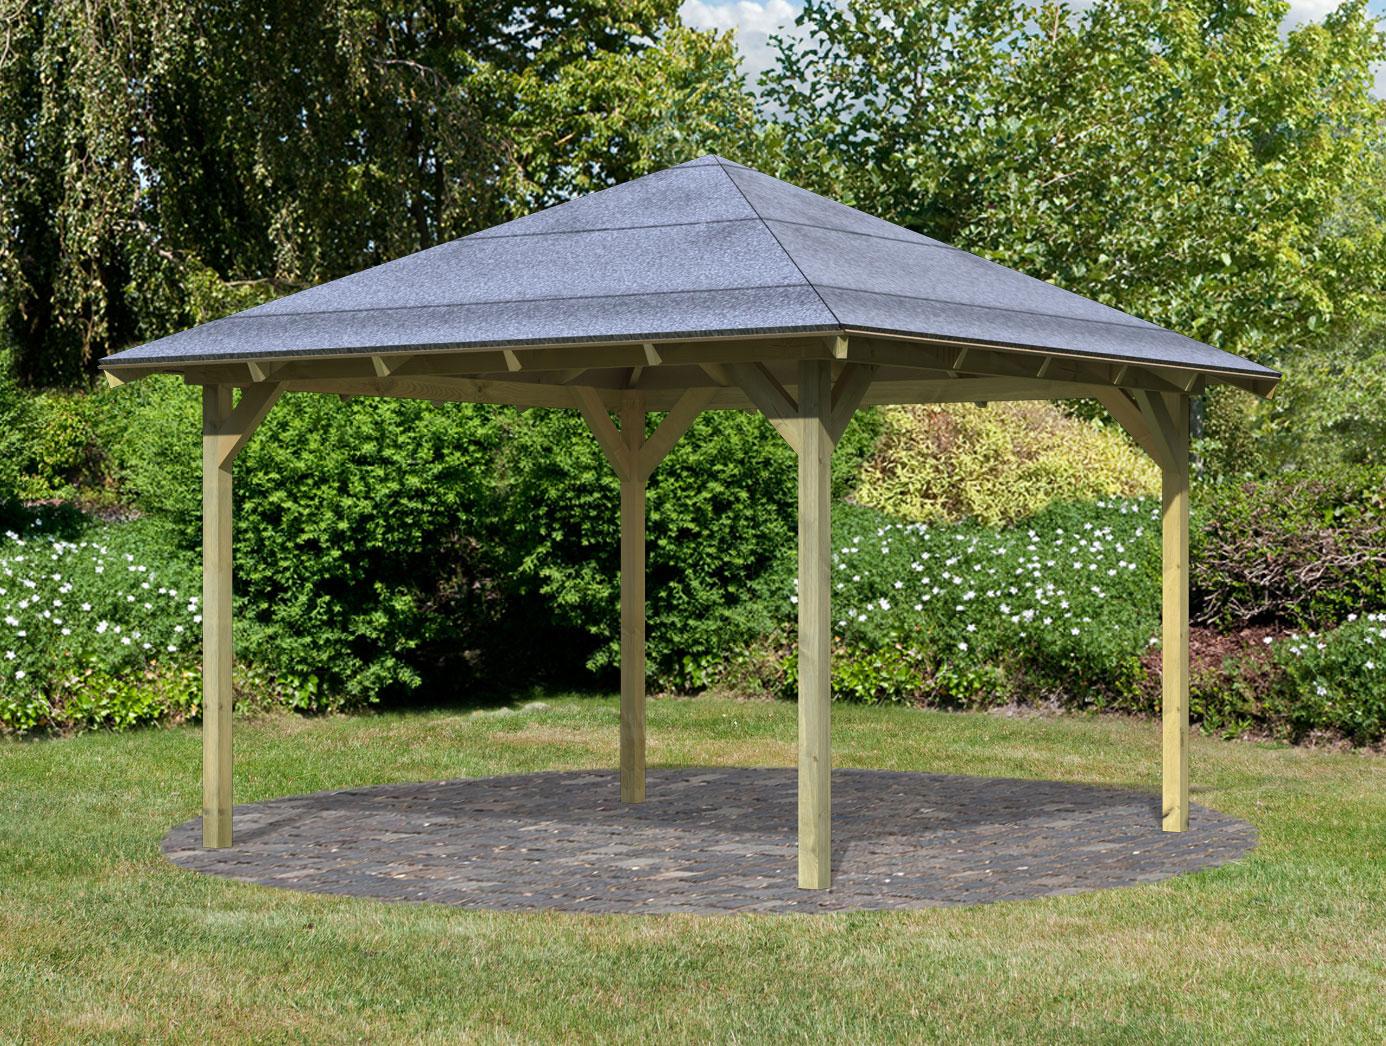 Karibu Holzpavillon Granada kdi 377x377cm Bild 1